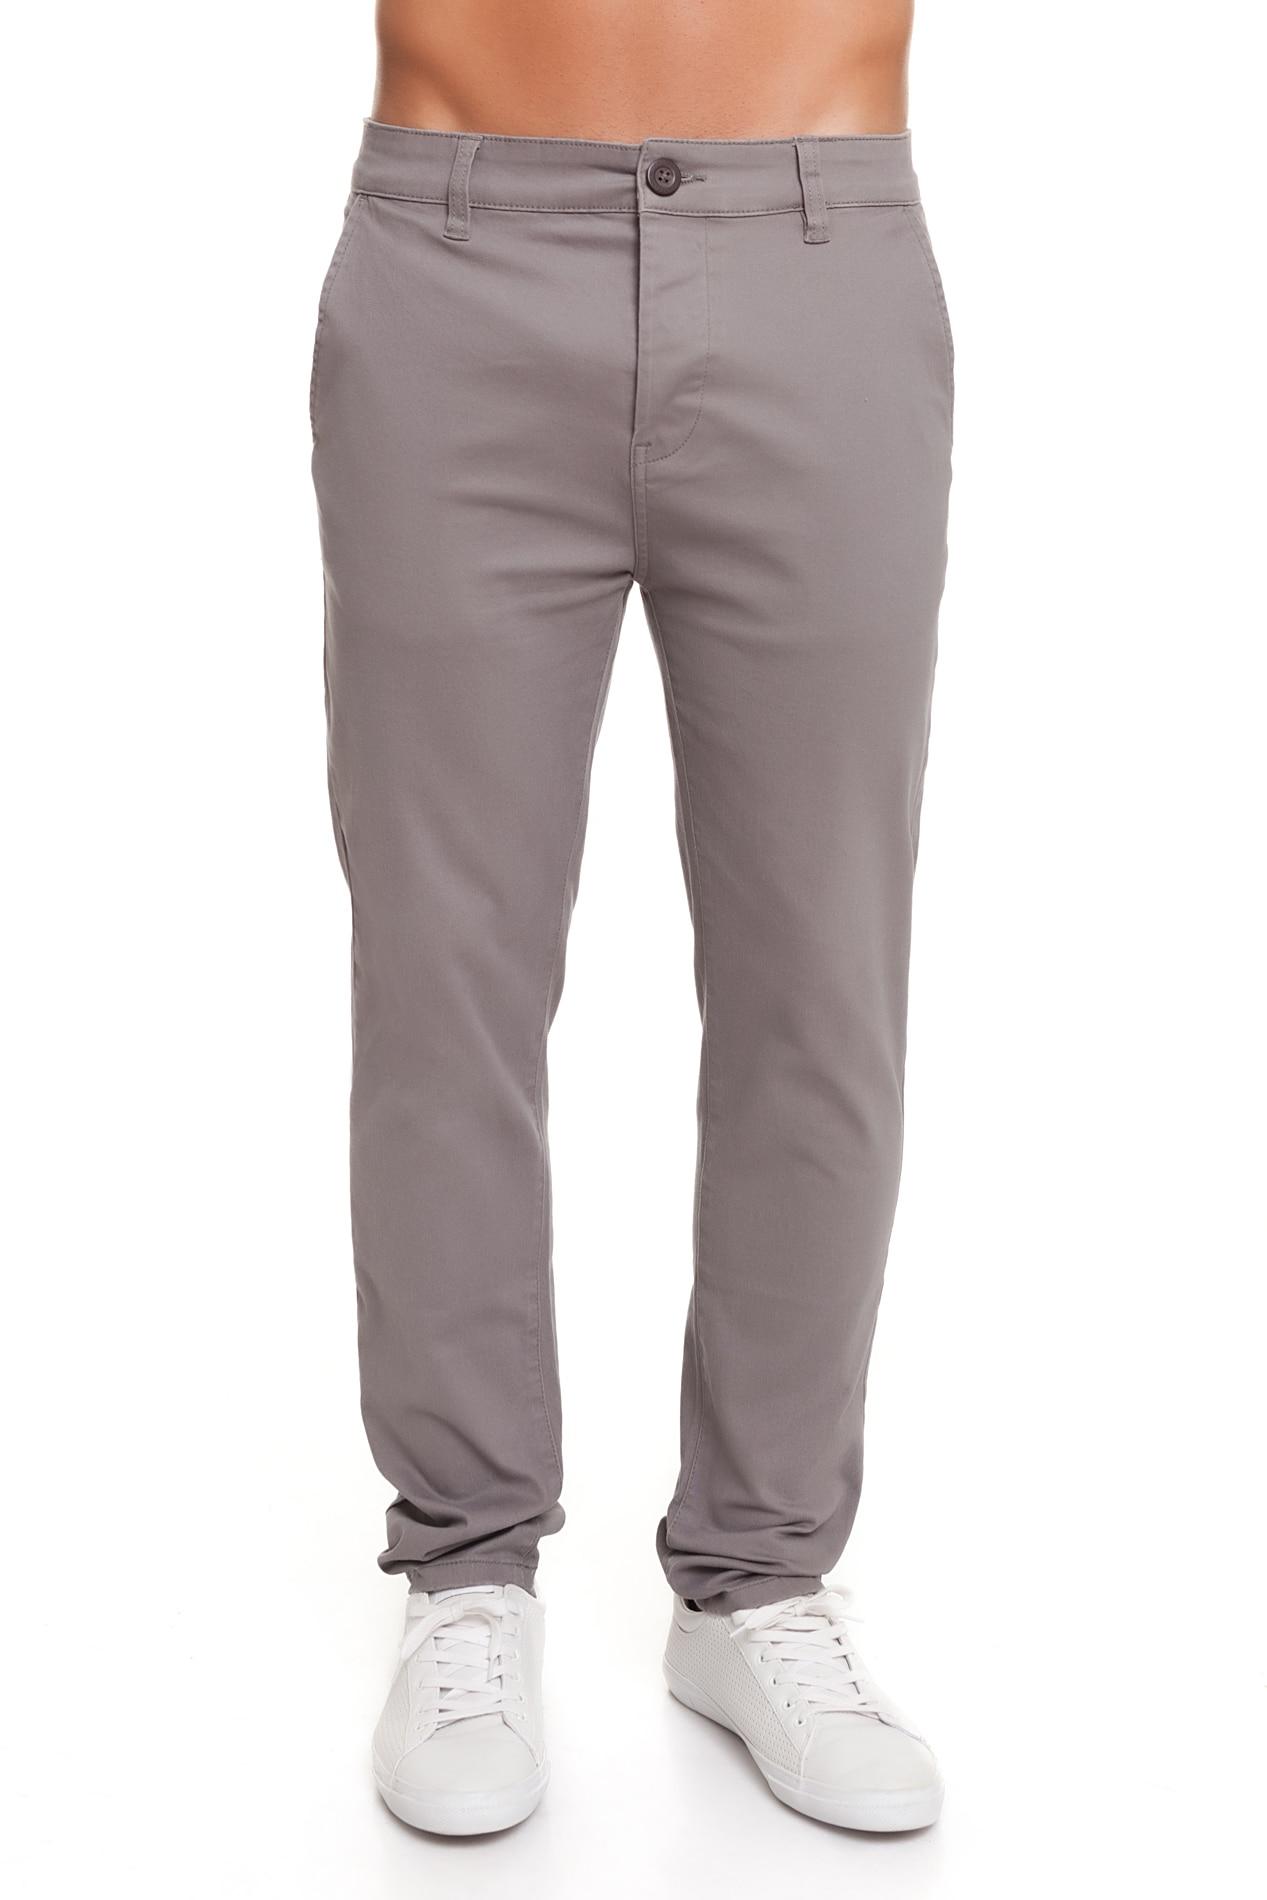 Crosshatch Hombre Pantalon Chino 2019 CH2B112040CG2STK Moda Fashion Gris